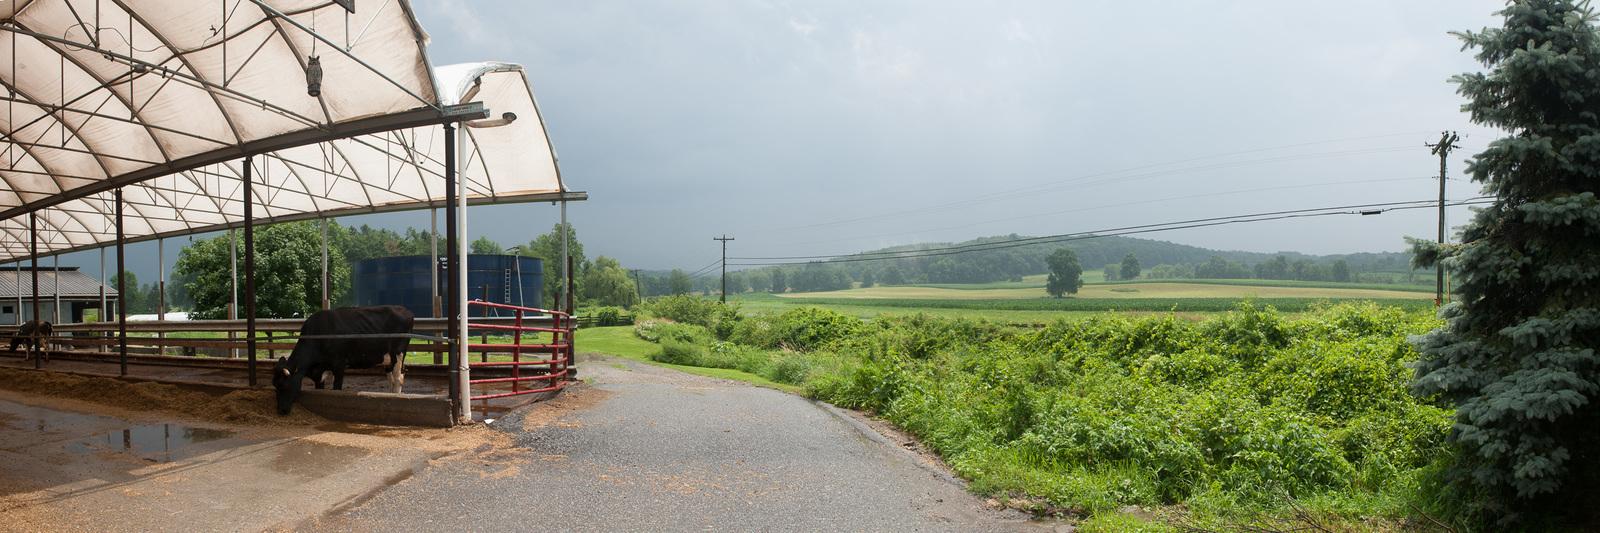 Donovan Dairy at Bos-Haven Farm